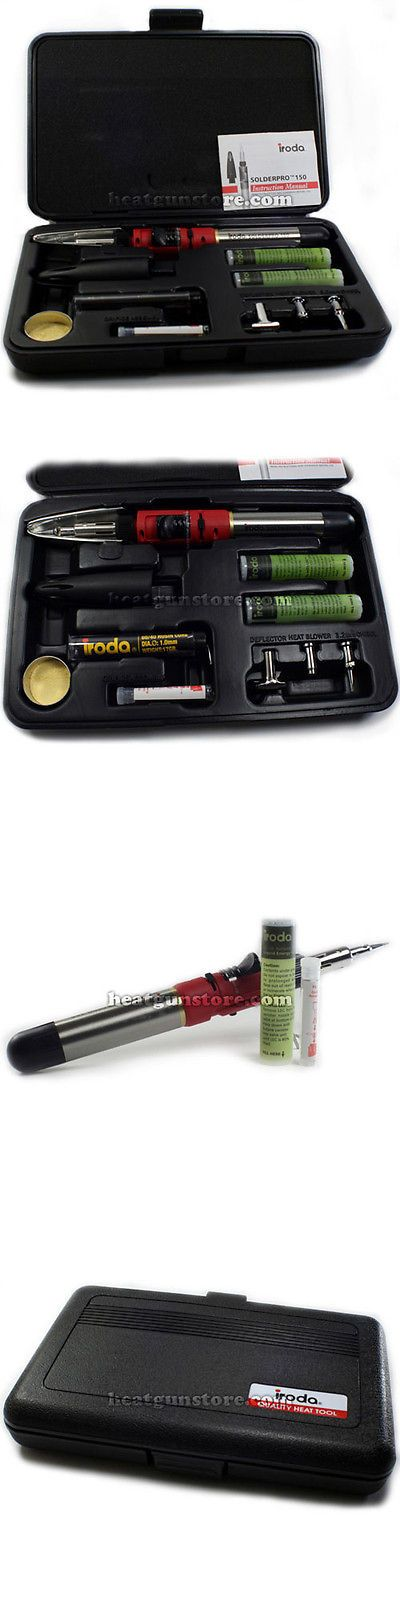 Welding and Soldering Tools 46413: Iroda Solderpro 150 Butane Gas Soldering Iron Kit -> BUY IT NOW ONLY: $101.95 on eBay!